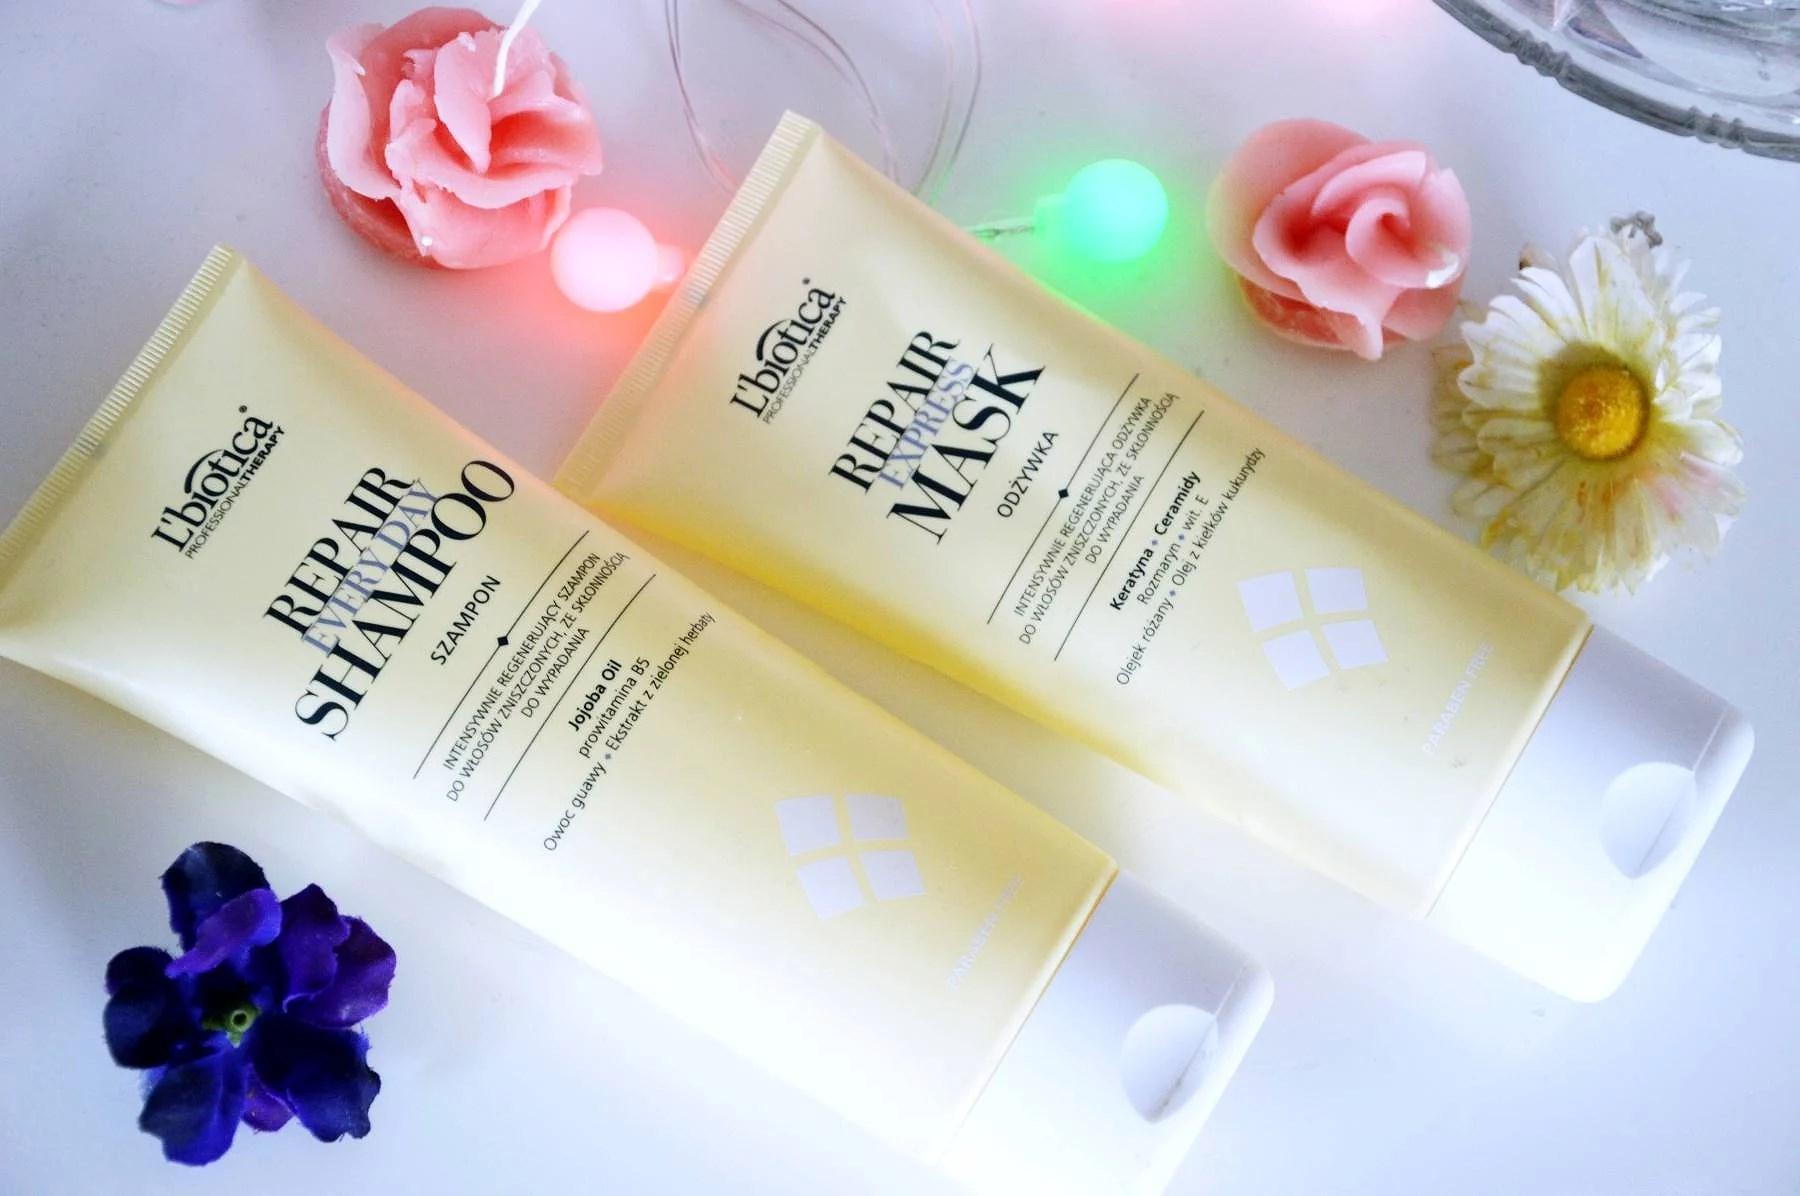 Professional therapy repair - szampon i odżywka. L'Biotica.